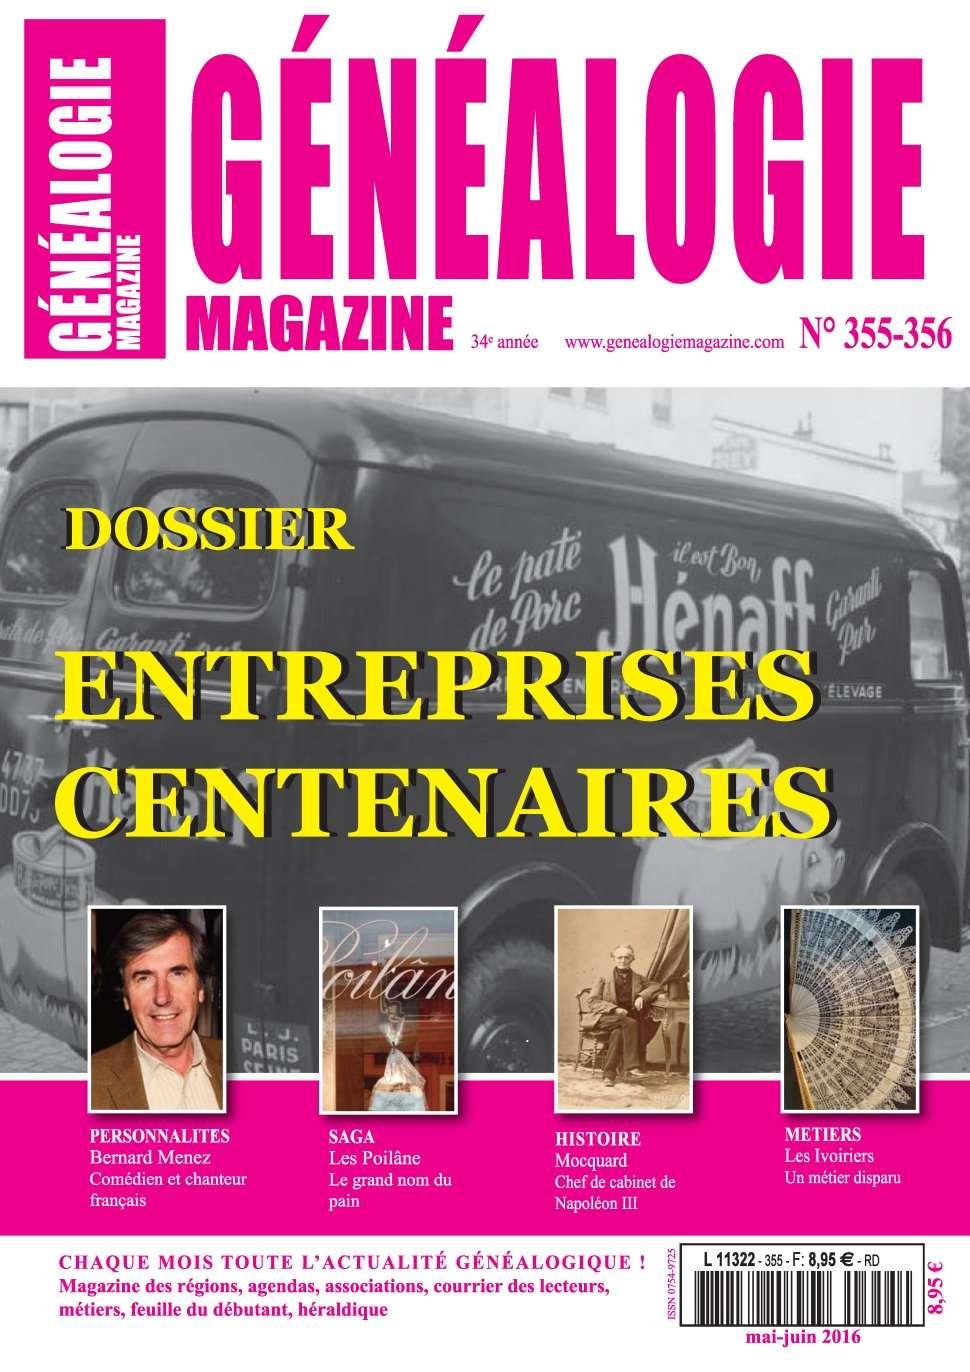 Généalogie Hors-Série 35-5356 - Juin 2016